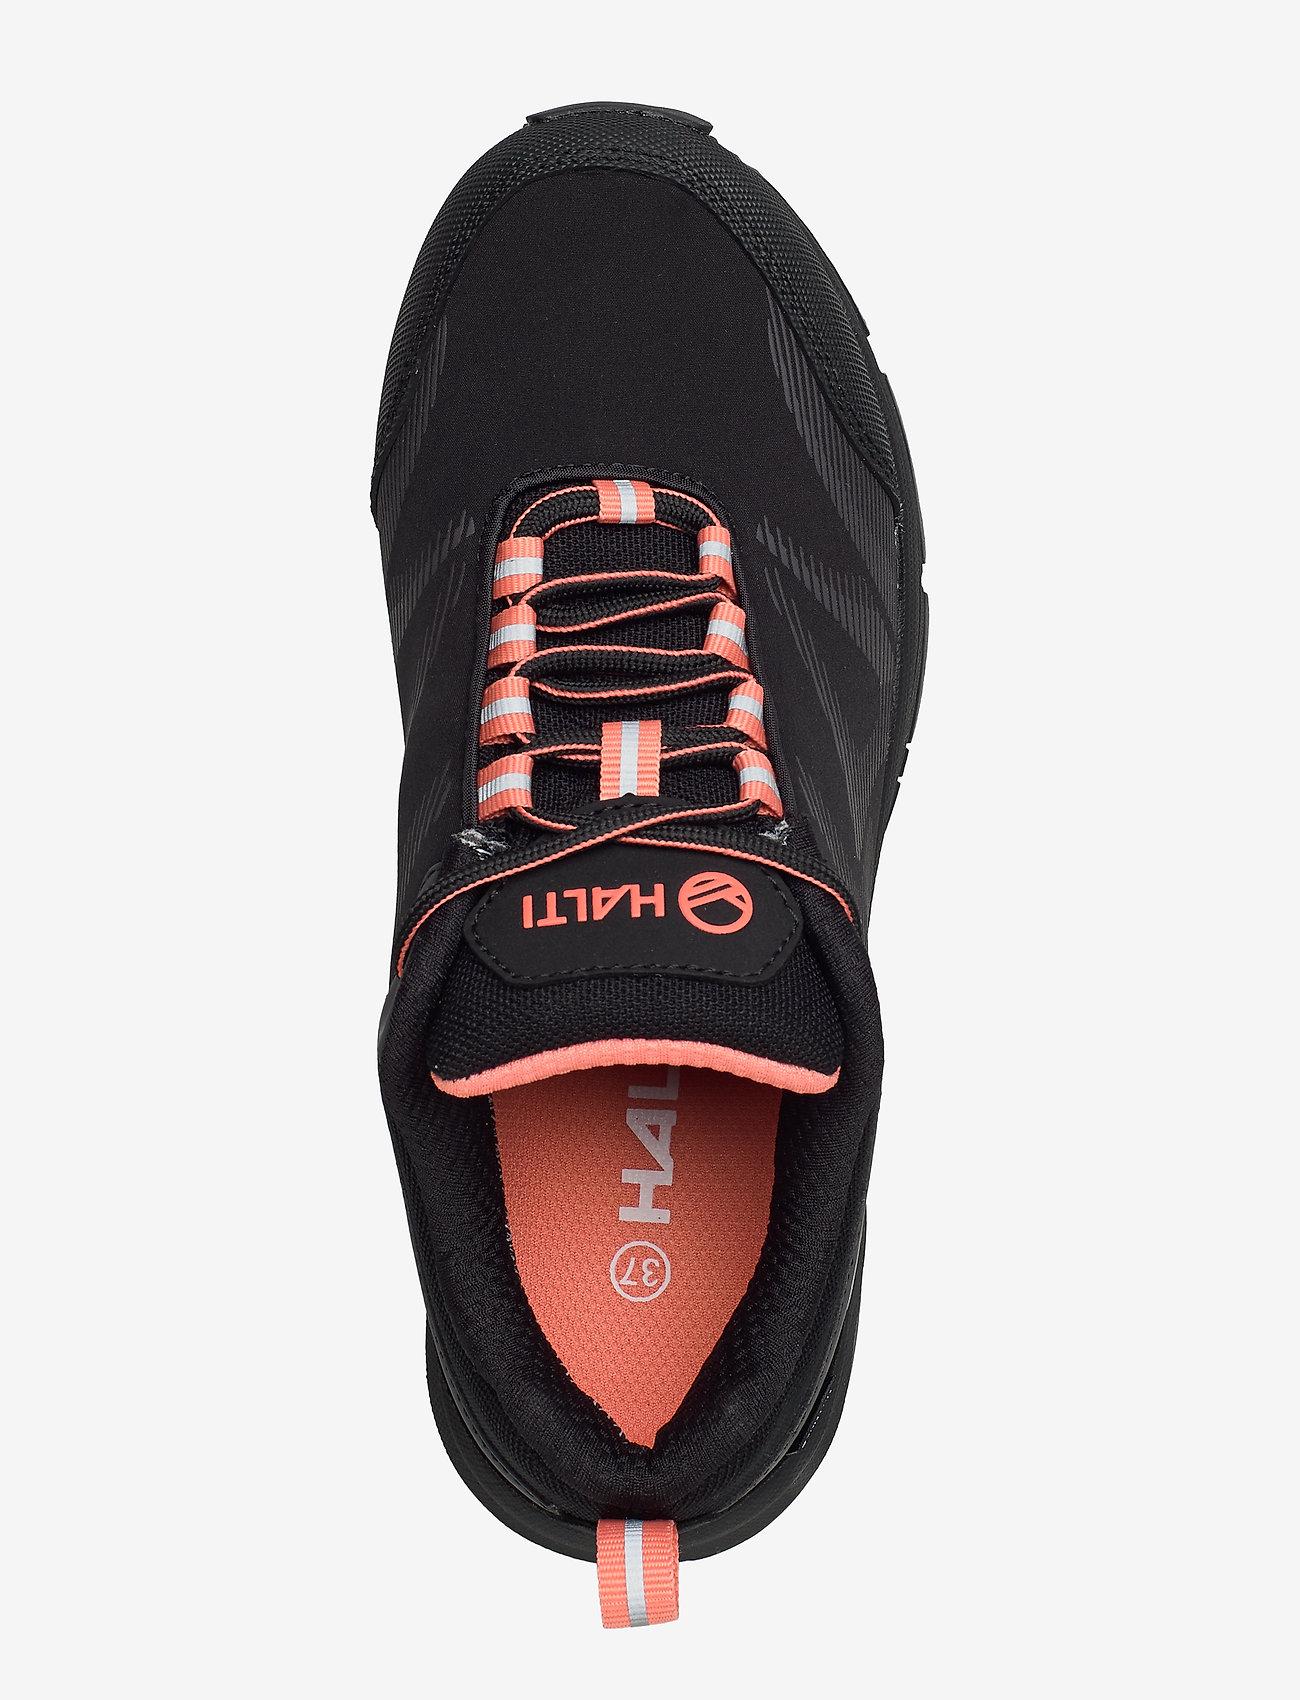 Myre Women's Low Drymaxx Outdoor Shoes (Black) - Halti